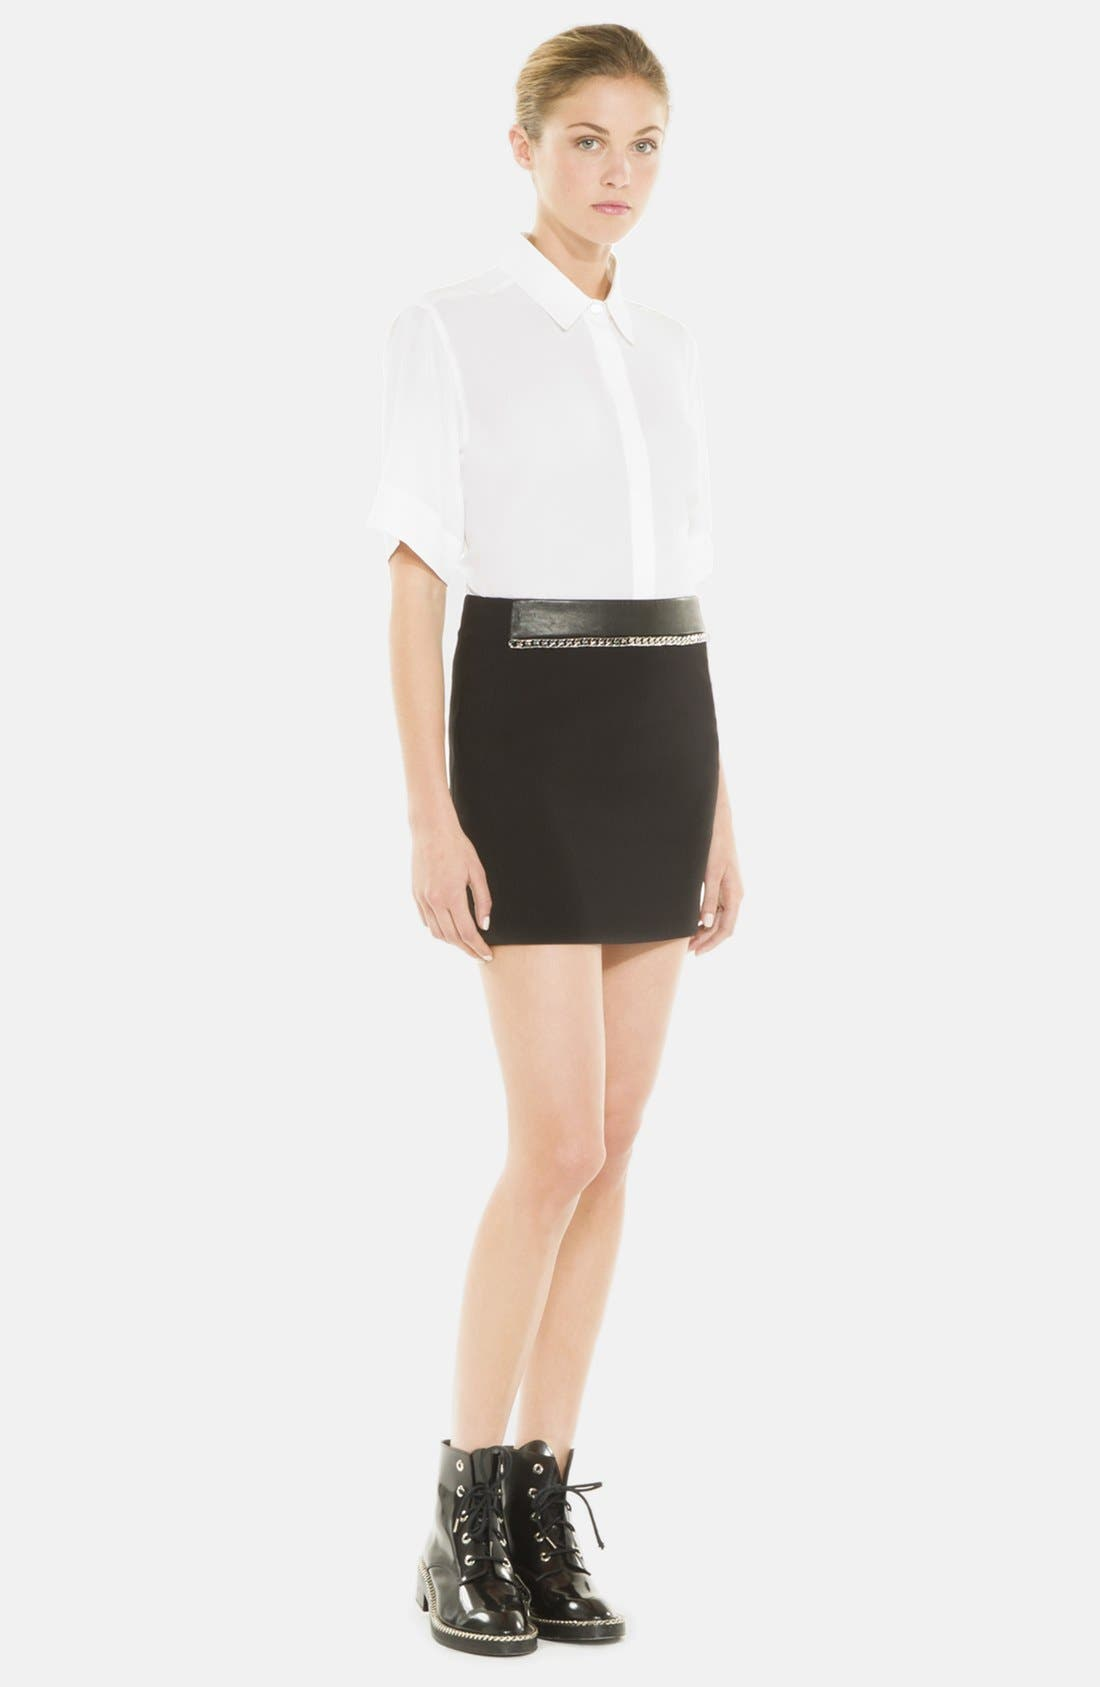 Alternate Image 1 Selected - sandro 'Joyau' Leather & Chain Detail Skirt